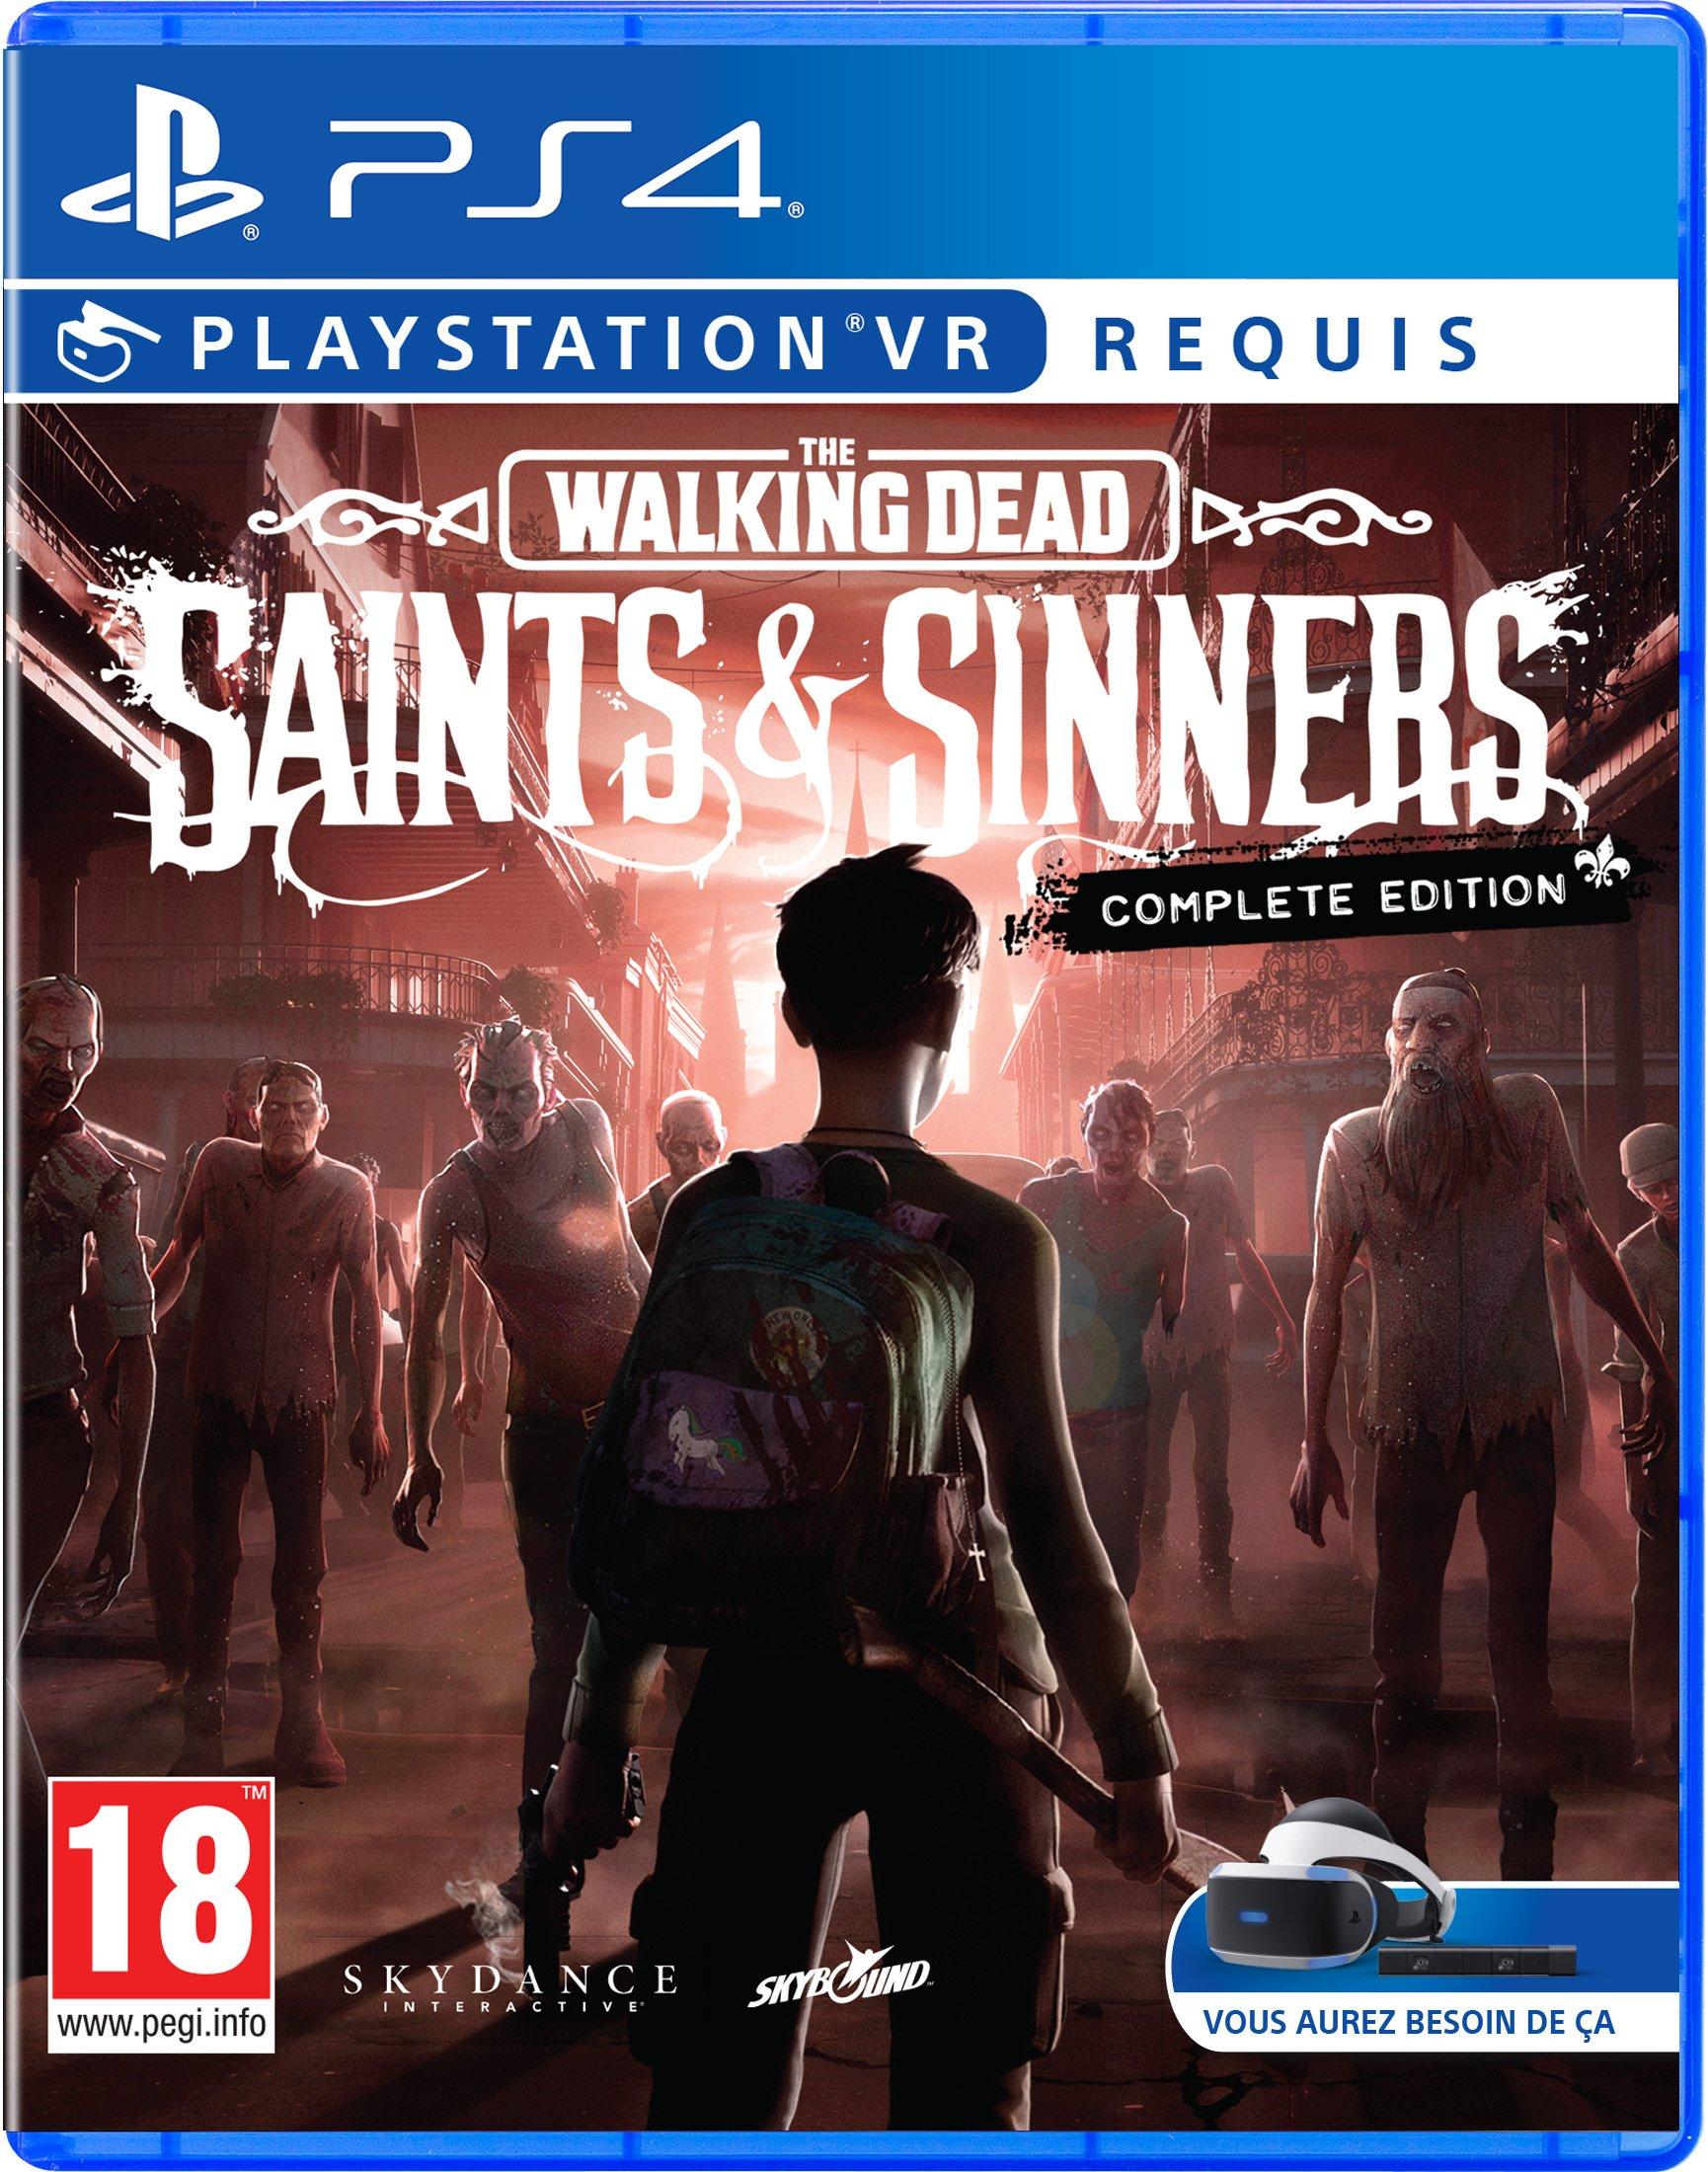 The Walking Dead: Saints & Sinners – The Complete Edition Copy (PSVR)